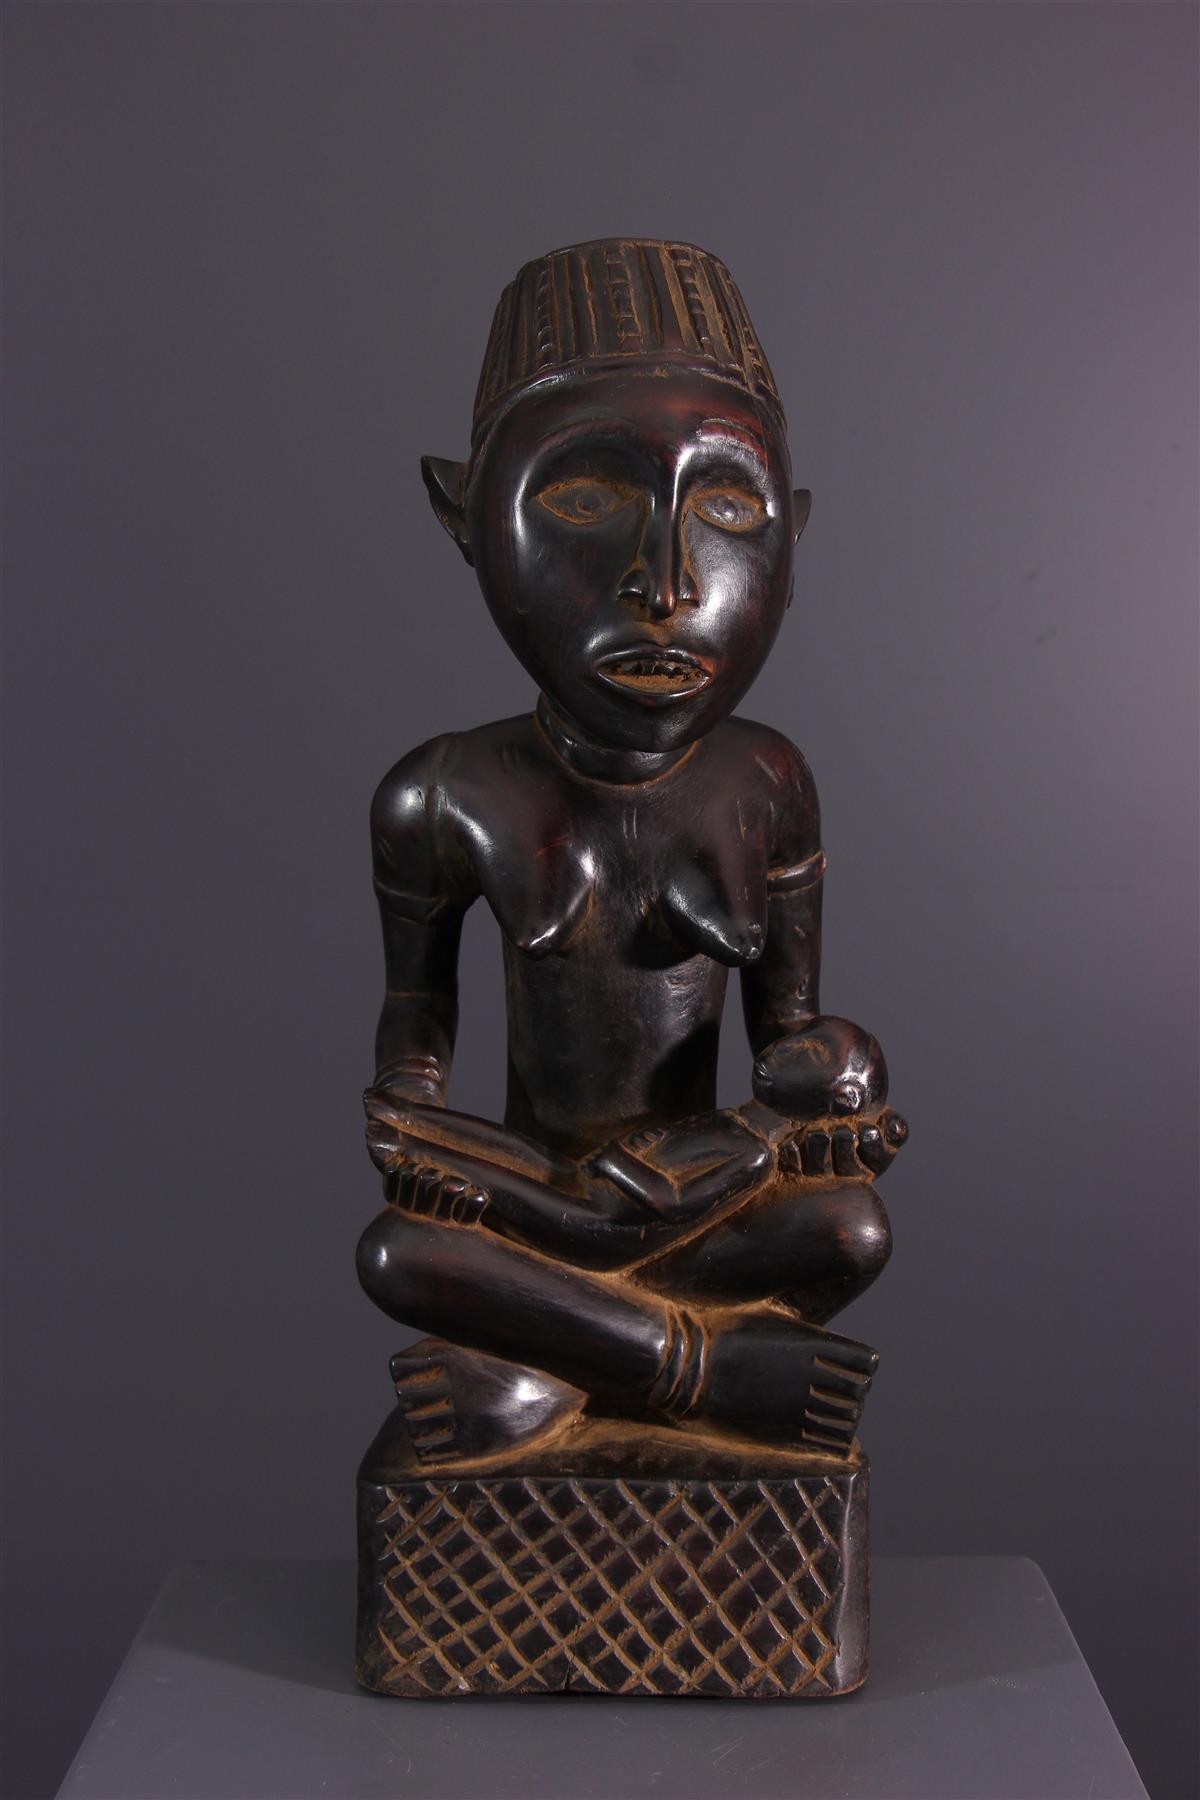 Kongo Maternity - African art